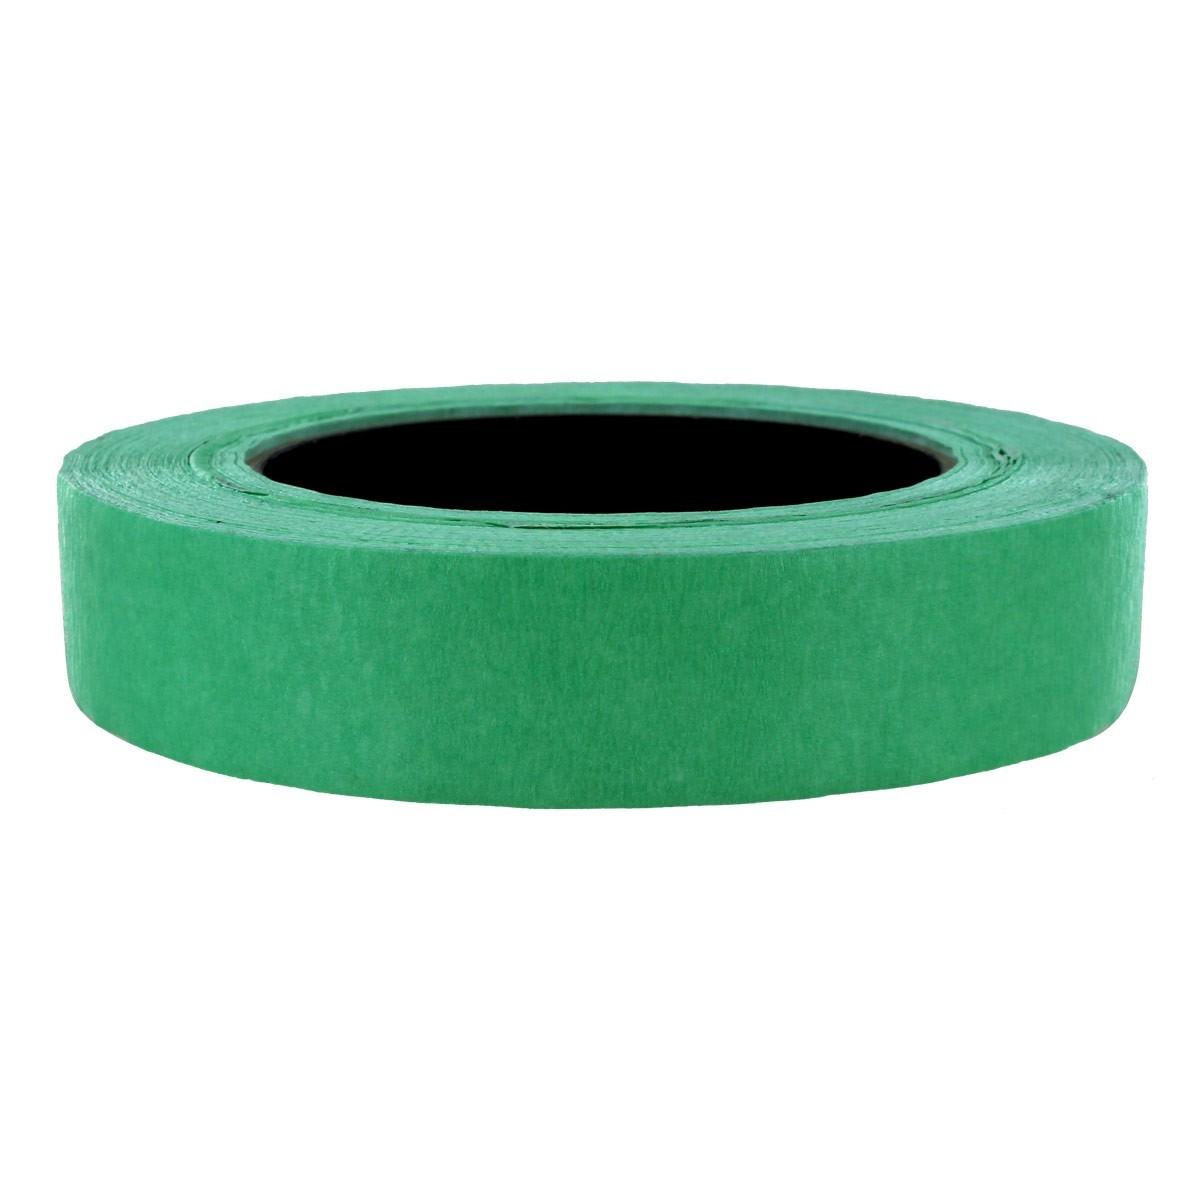 Masking Painters Tape, Green, 24 mm x 55 m, 48/cs